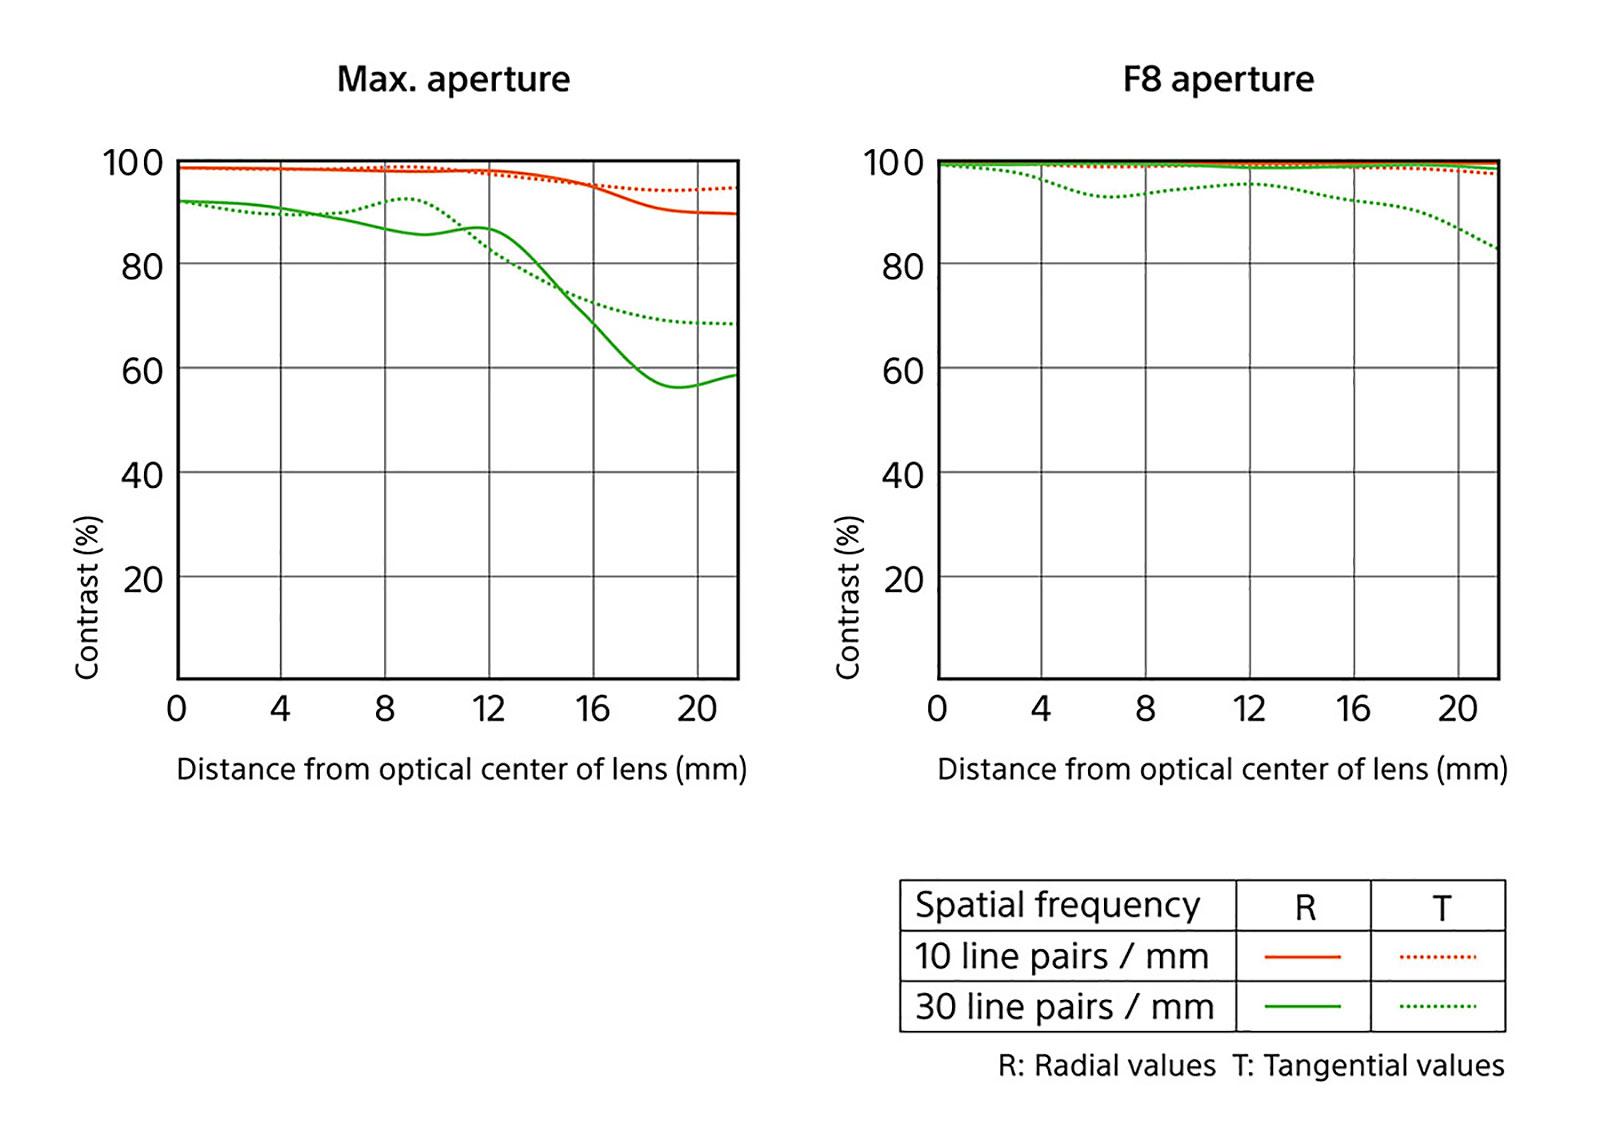 Sony FE 20mm F1.8 lens chart